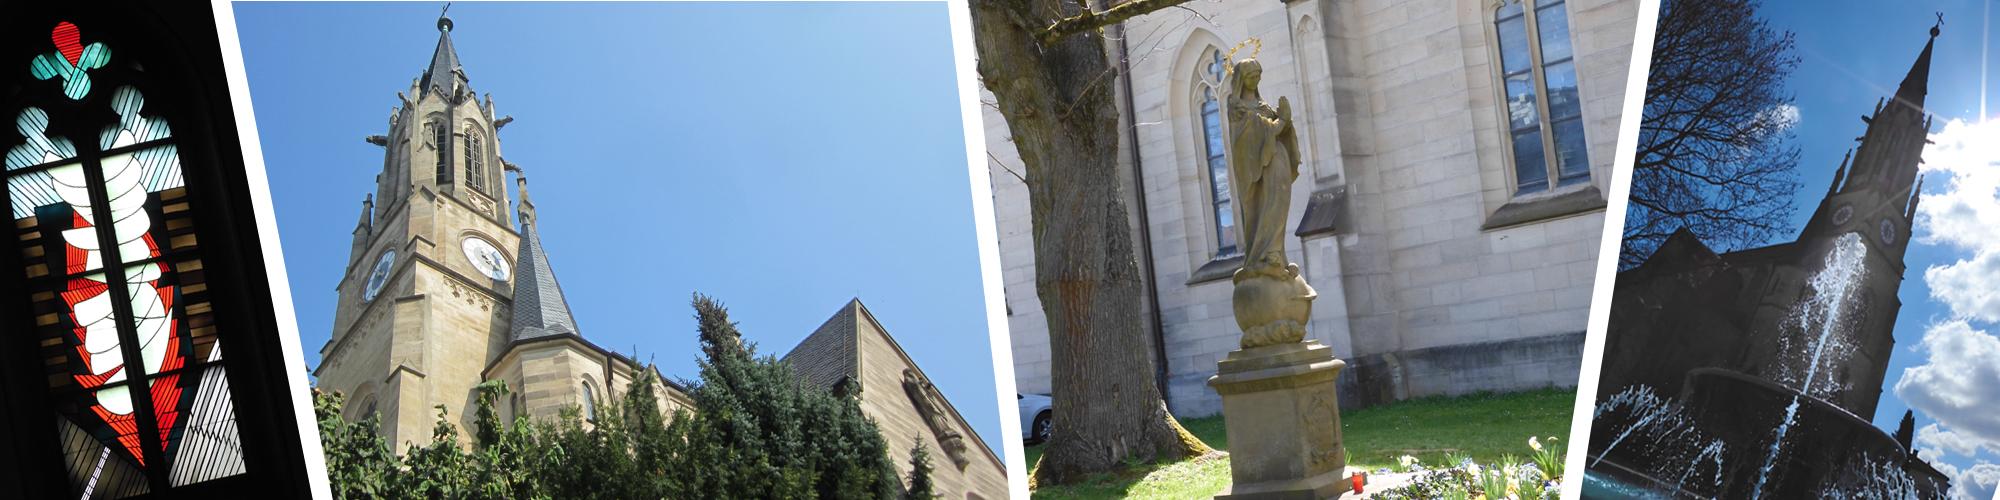 Stadtpfarrkirche Herz Jesu Bad Kissingen